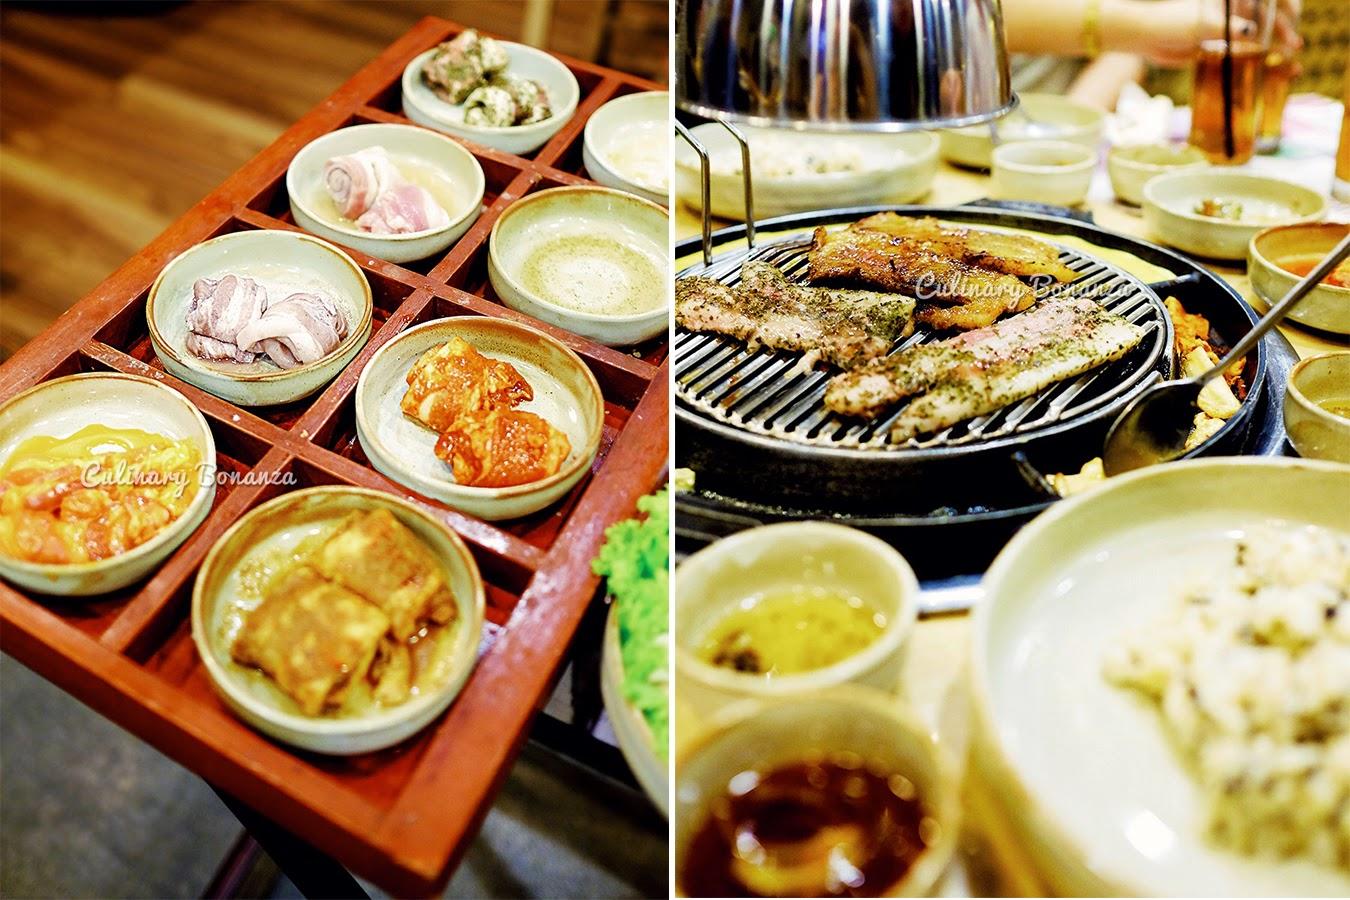 8 flavours Samgyeopsal - Gomawo Korean Grill & Restaurant (source: www.culinarybonanza.com)